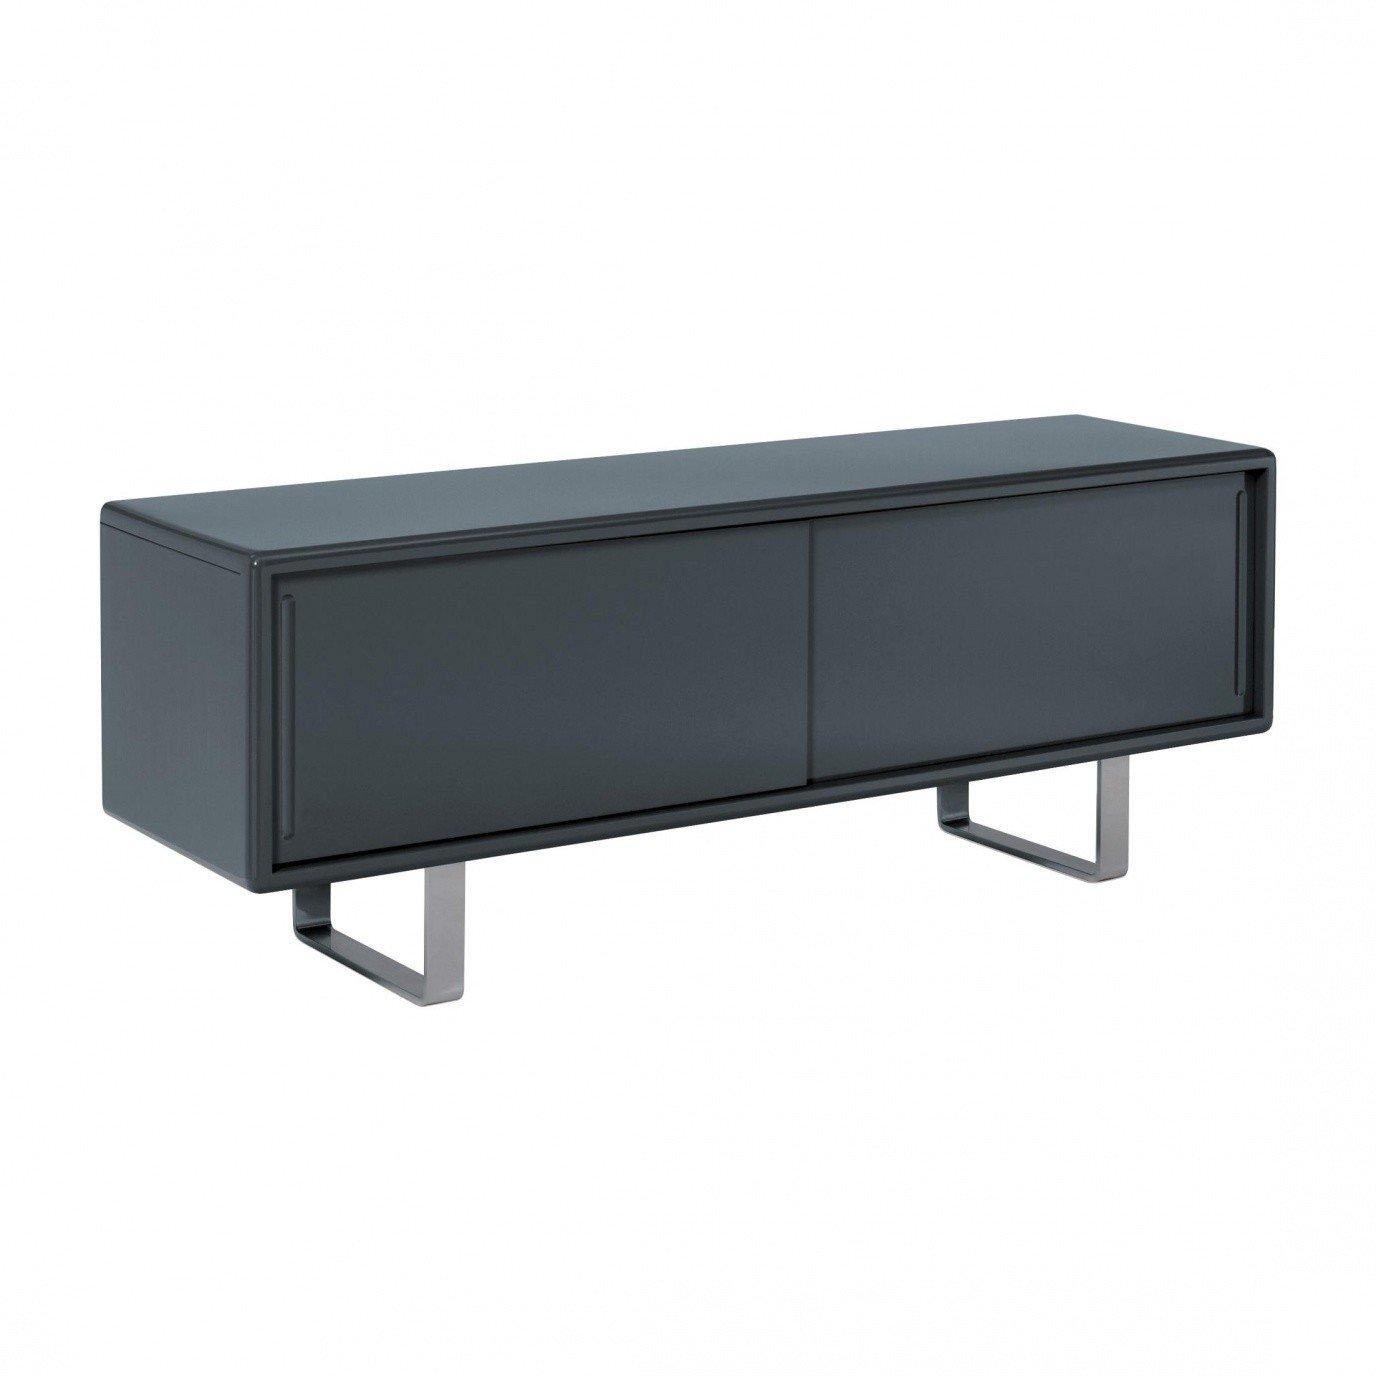 Mller Mbelfabrikation K16 S1 Sideboard With 2 Sliding Doors